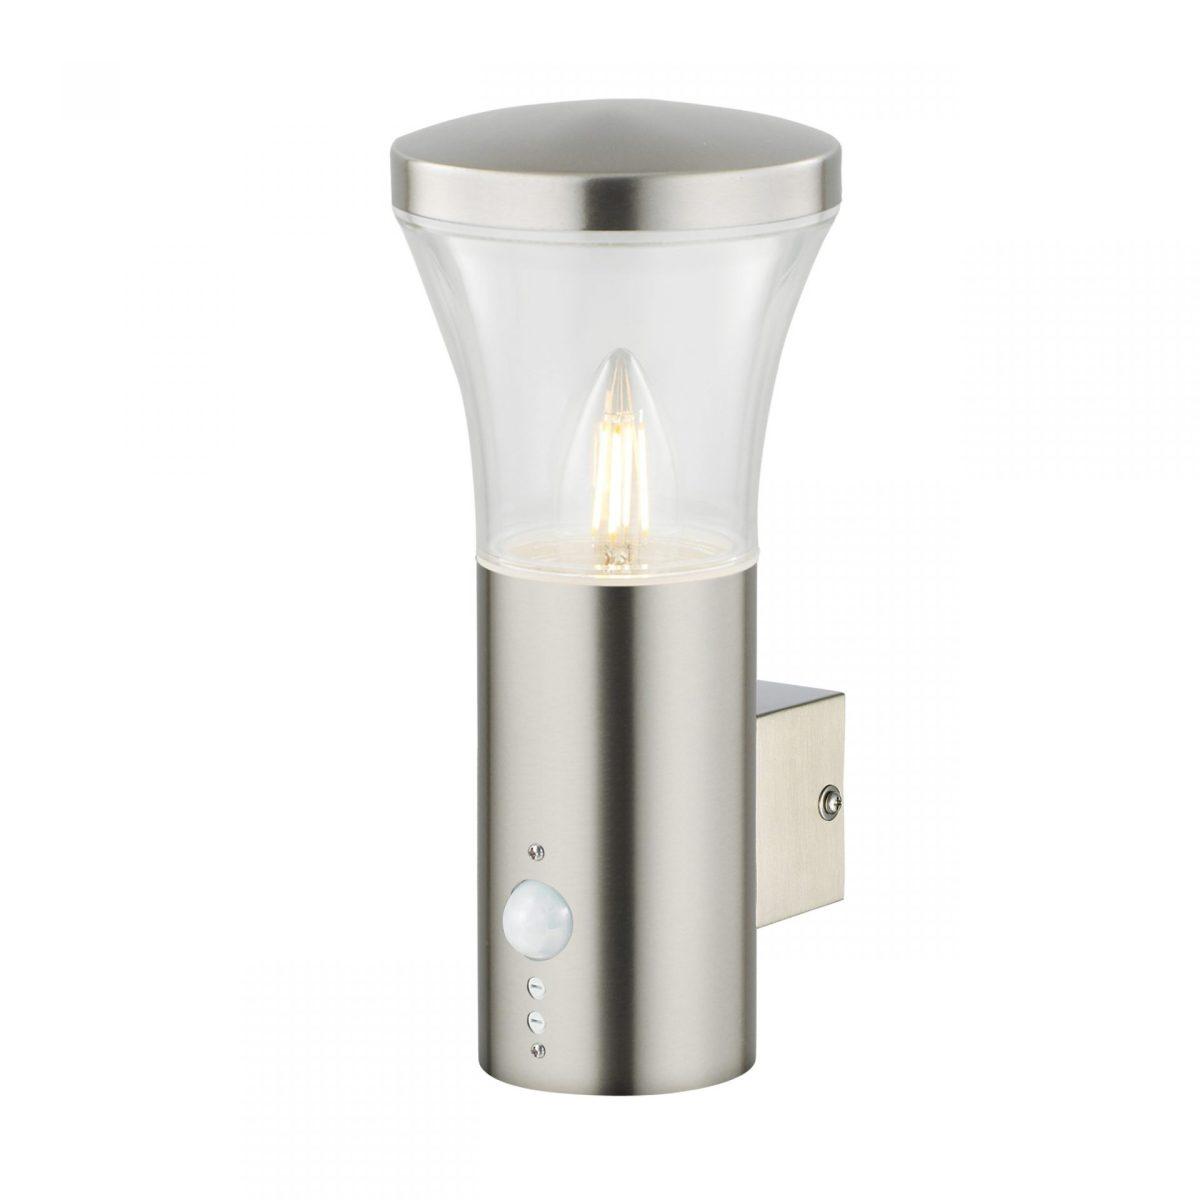 Outdoor Lighting Waterproof Wall Light WL-B9 SENSOR – COMING SOON